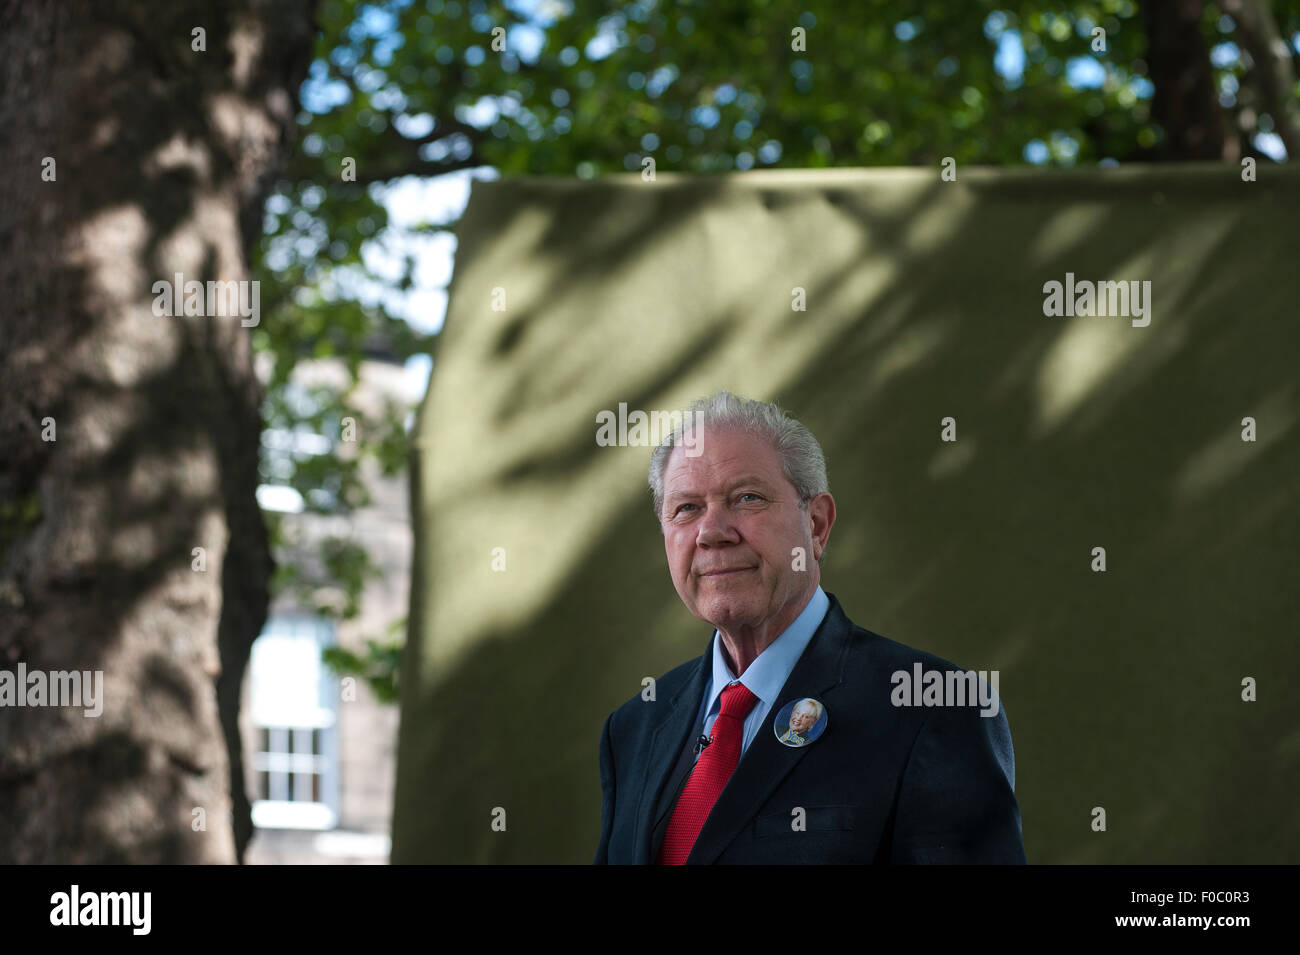 Scottish politician, Jim Sillars, appearing at the Edinburgh International Book Festival. - Stock Image